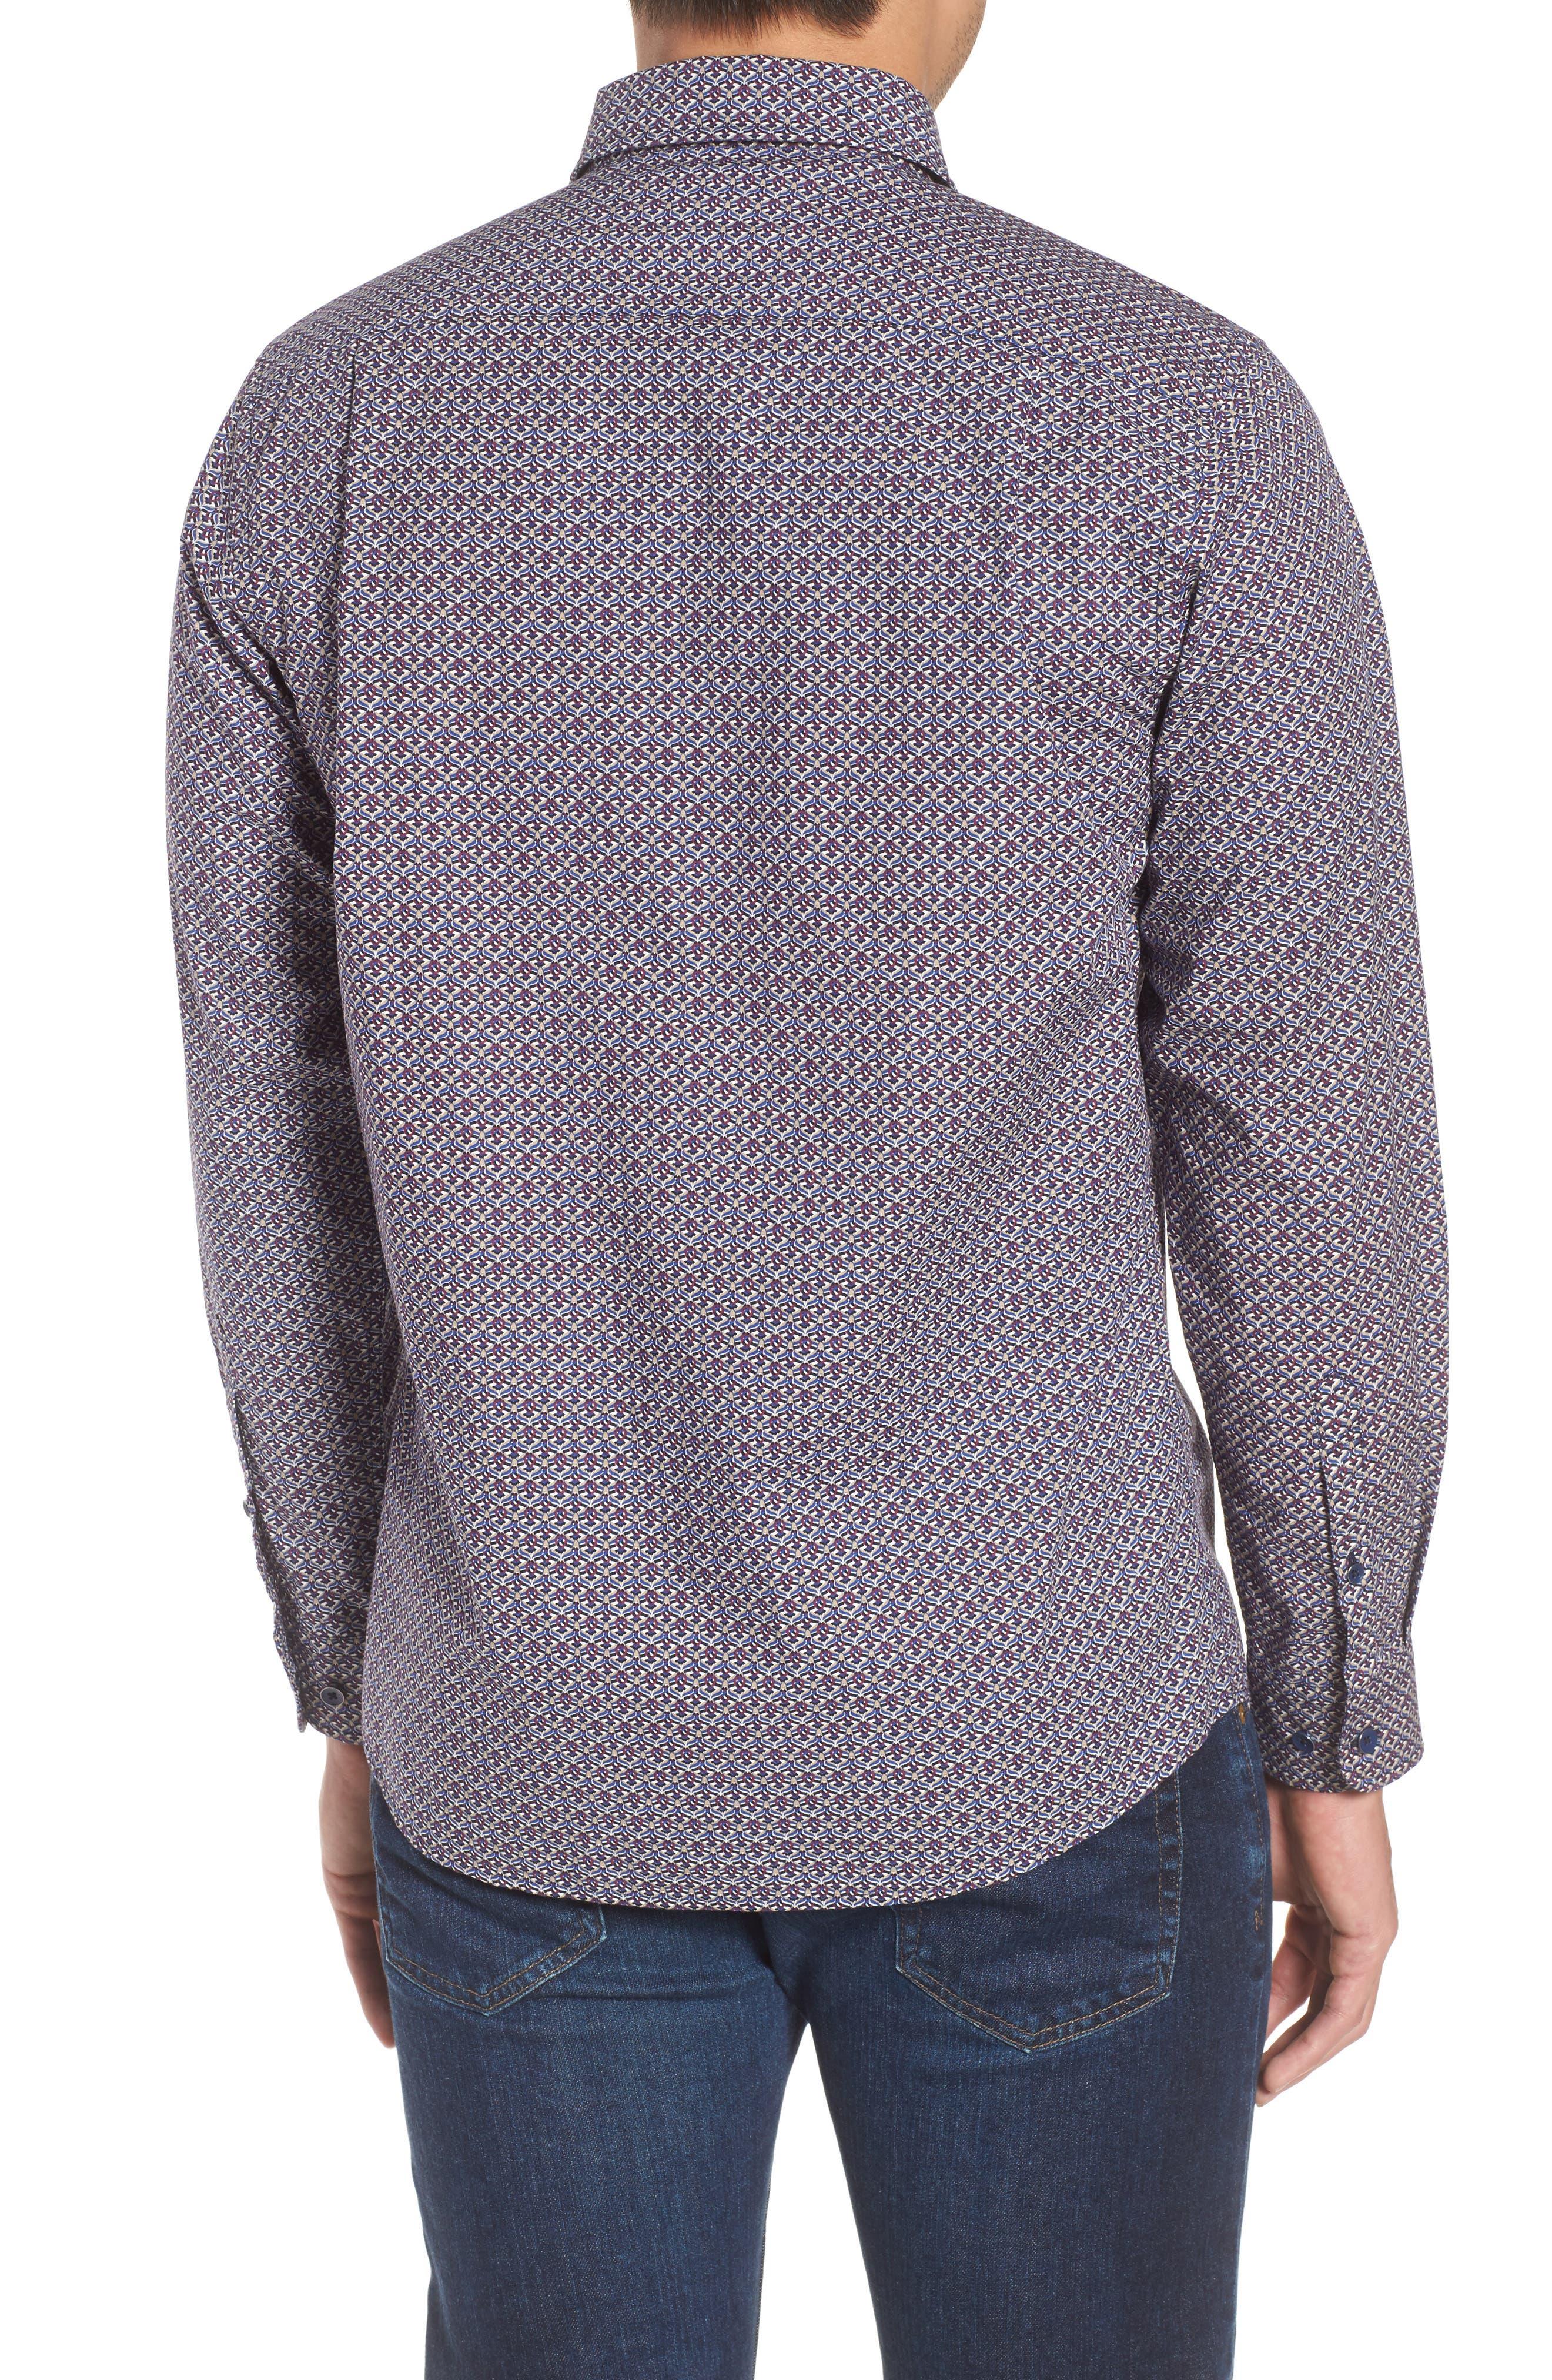 Fenton Park Regular Fit Sport Shirt,                             Alternate thumbnail 2, color,                             Royal